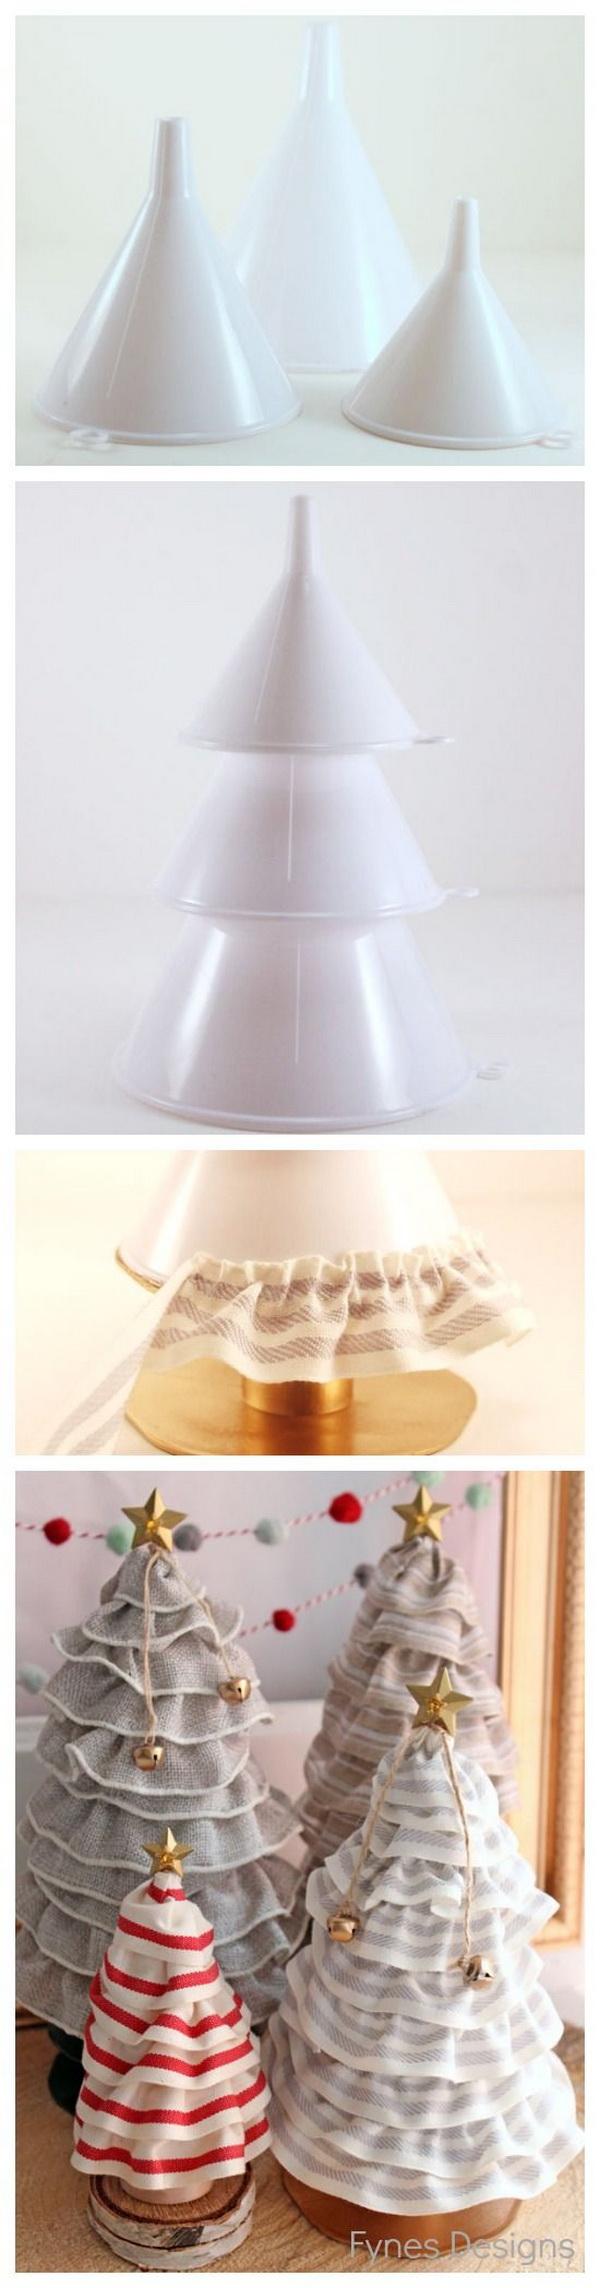 DIY No sew Ruffle Ribbon Christmas Tree Cones